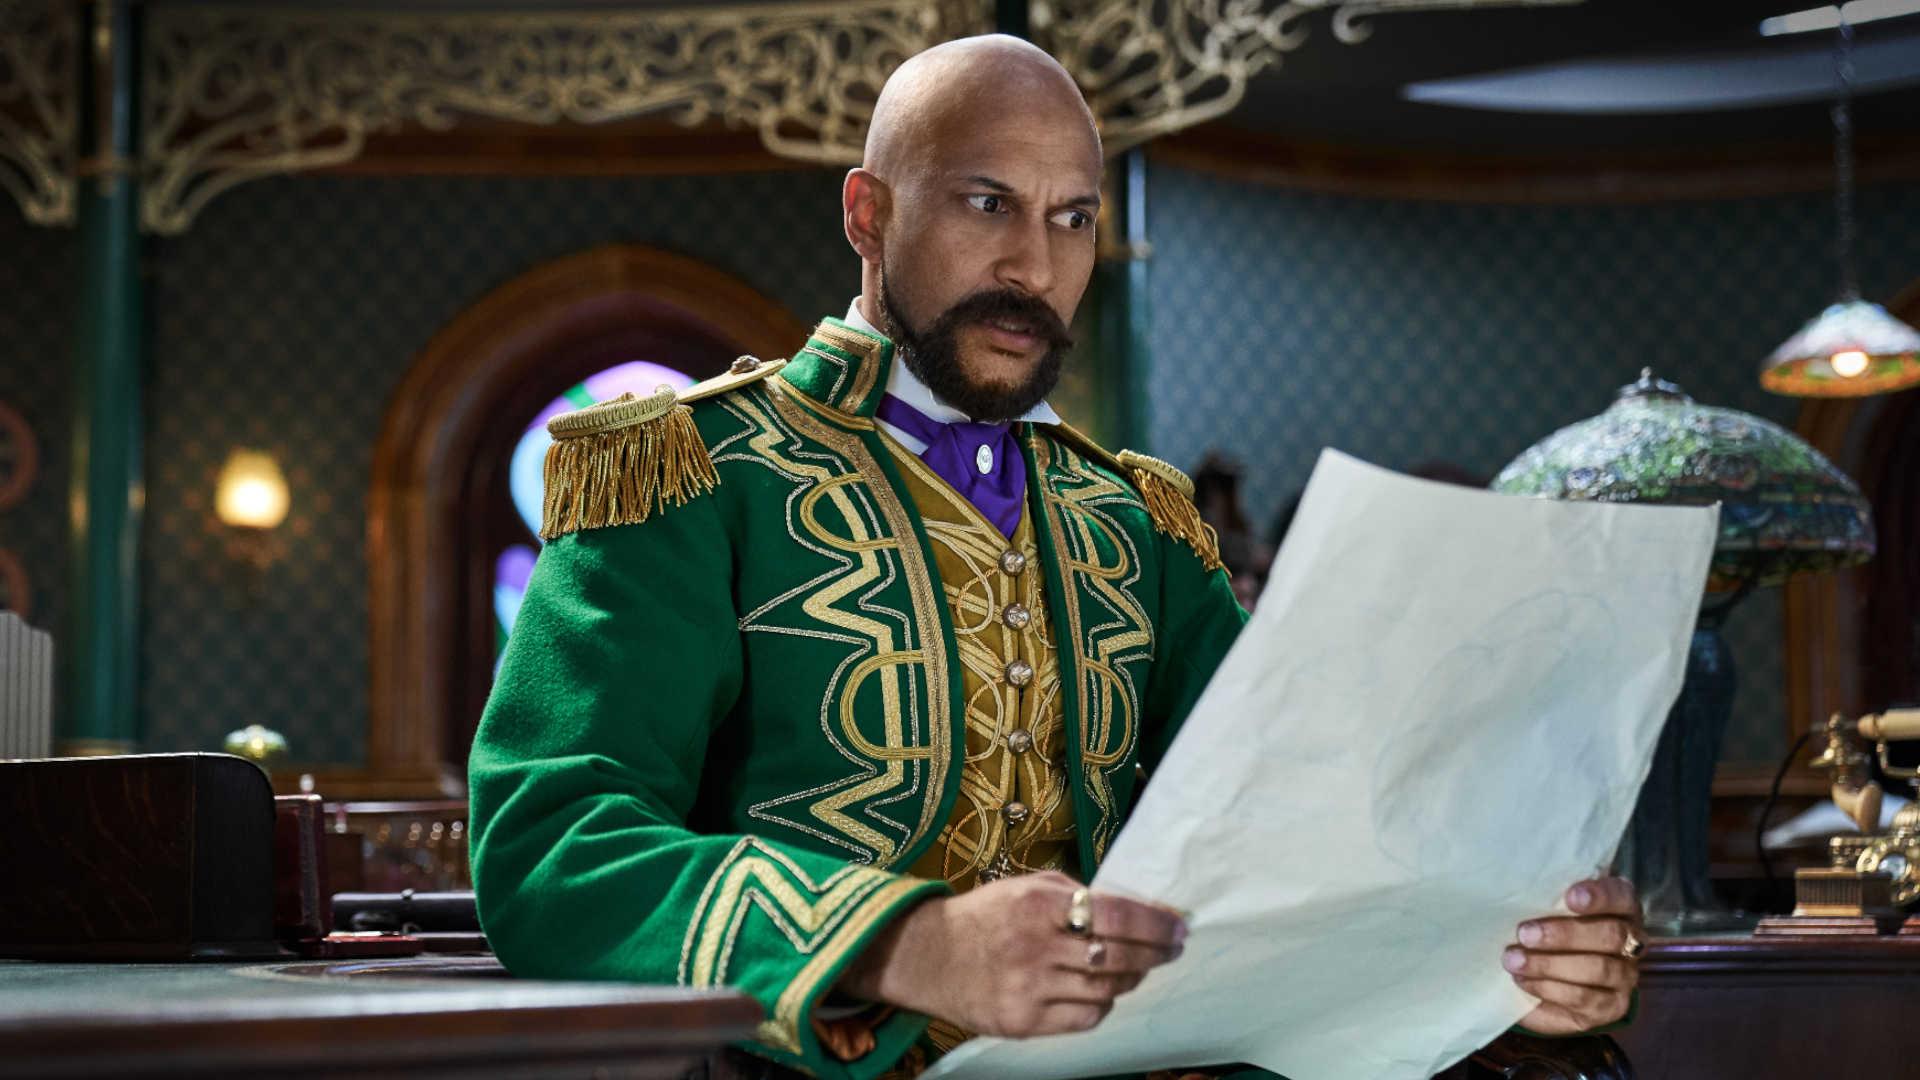 Keegan-Michael Key als Gustafson in Netflix' Jingle Jangle Journey: Abenteuerliche Weihnachten